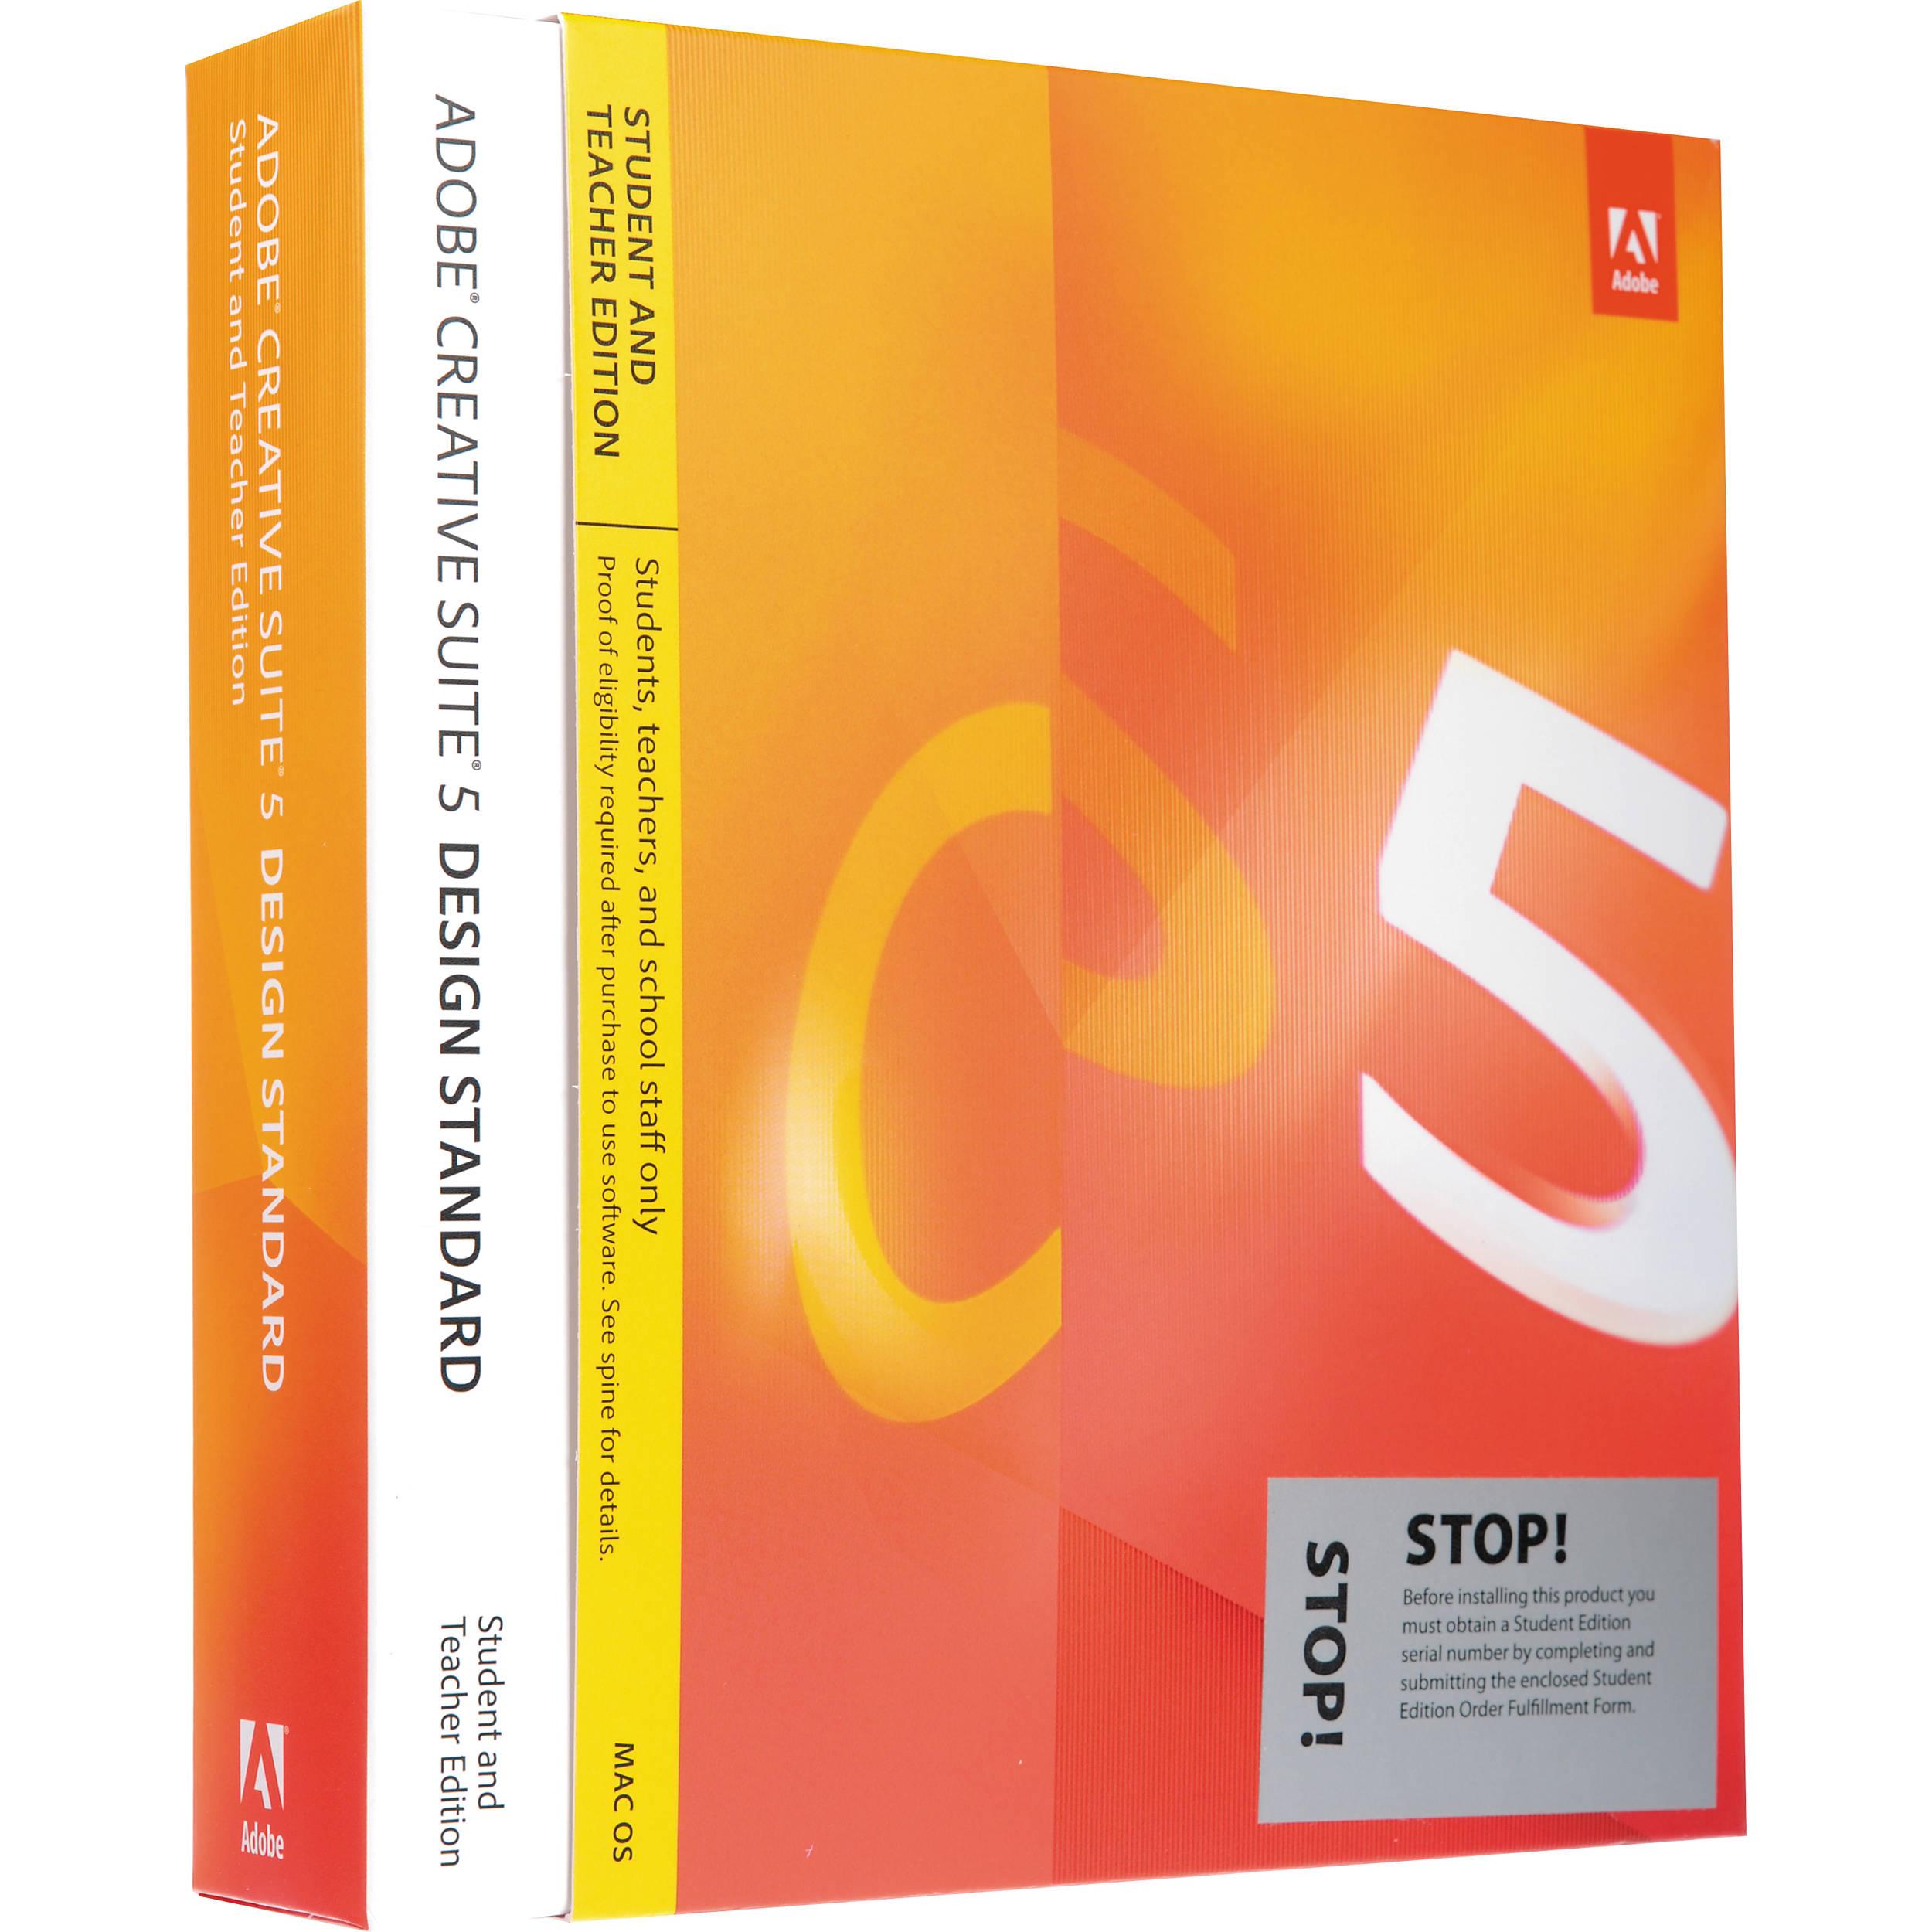 Cheap Adobe Dreamweaver Cs5.5 Student And Teacher Edition